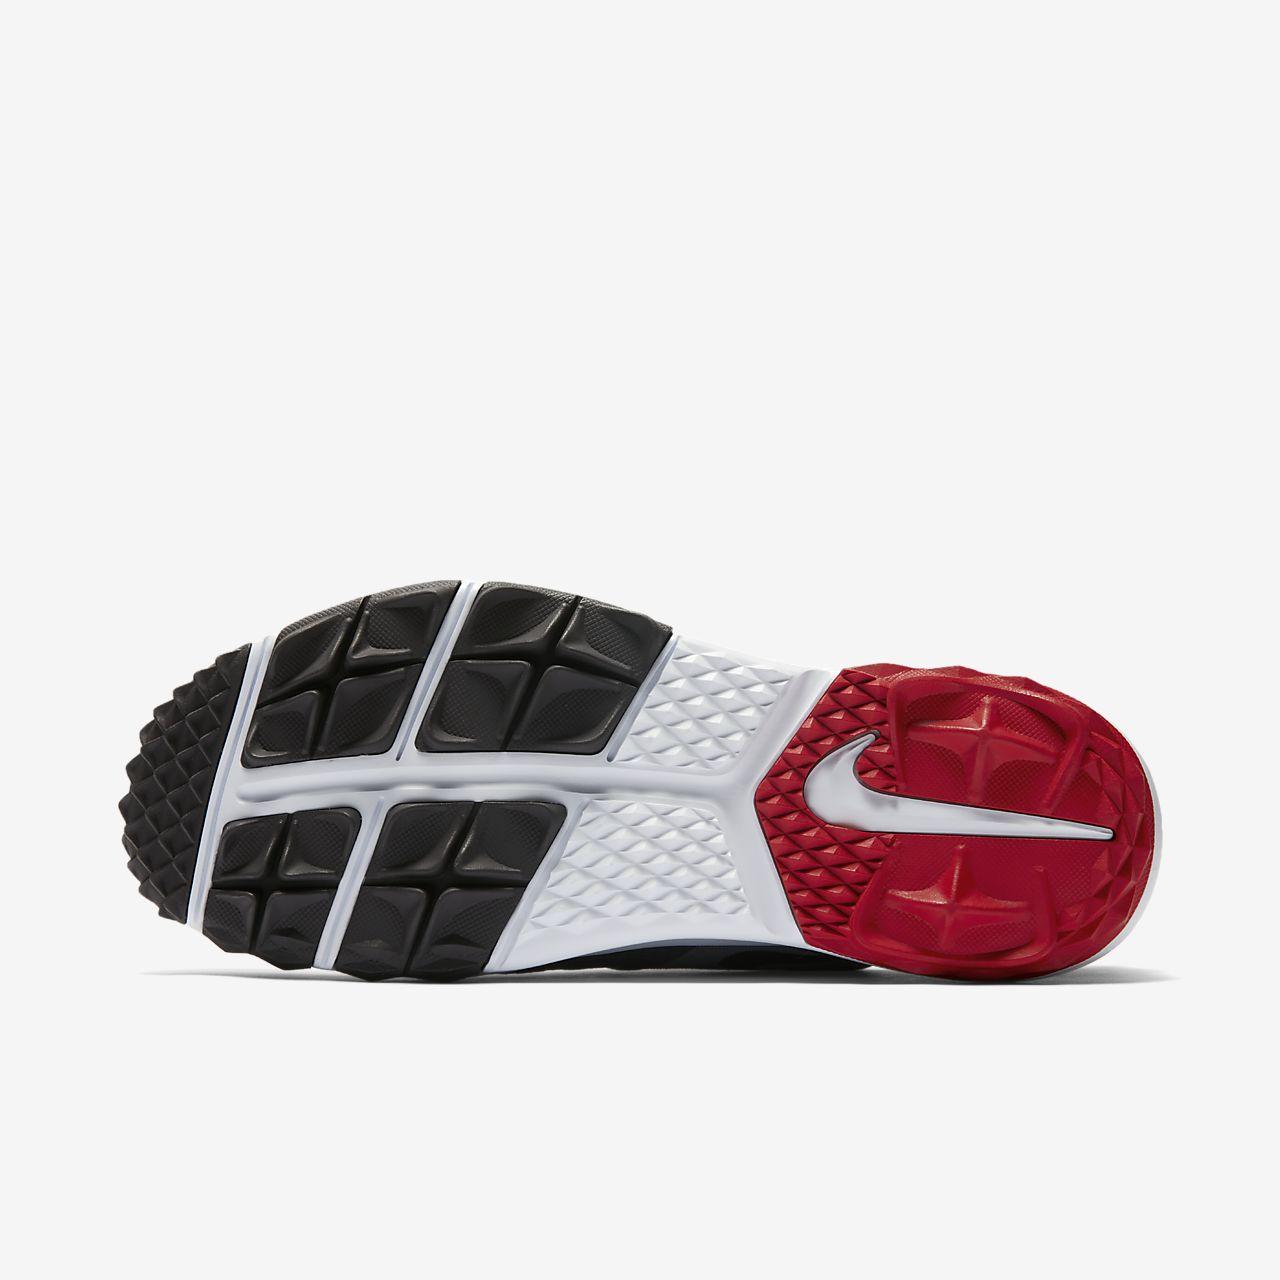 best service 08527 4ecde Nike FI Impact 3 Herren-Golfschuh. Nike.com AT